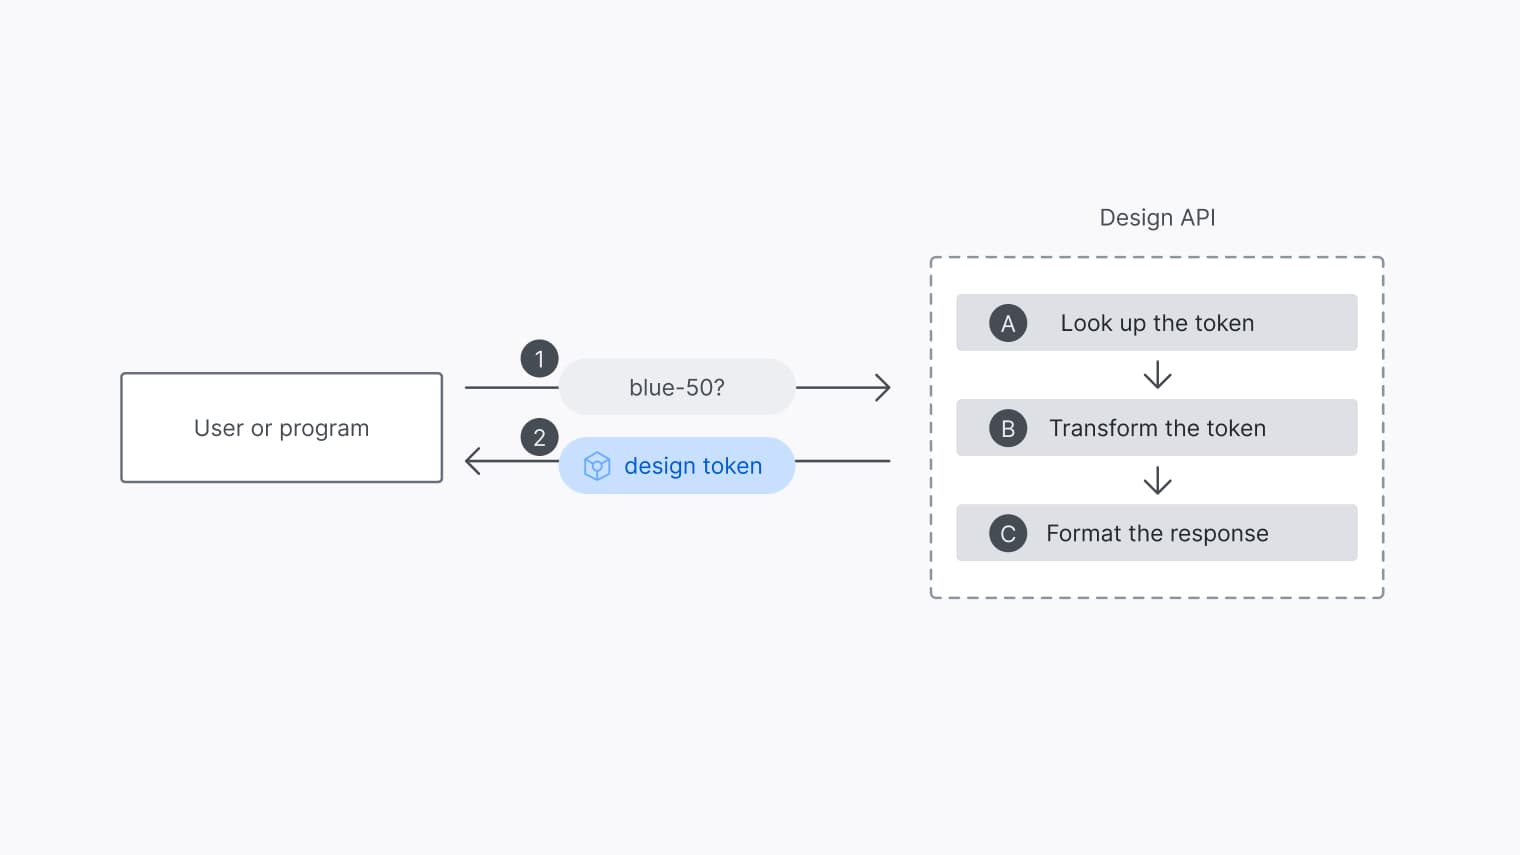 A closer look at the internal process of the design API